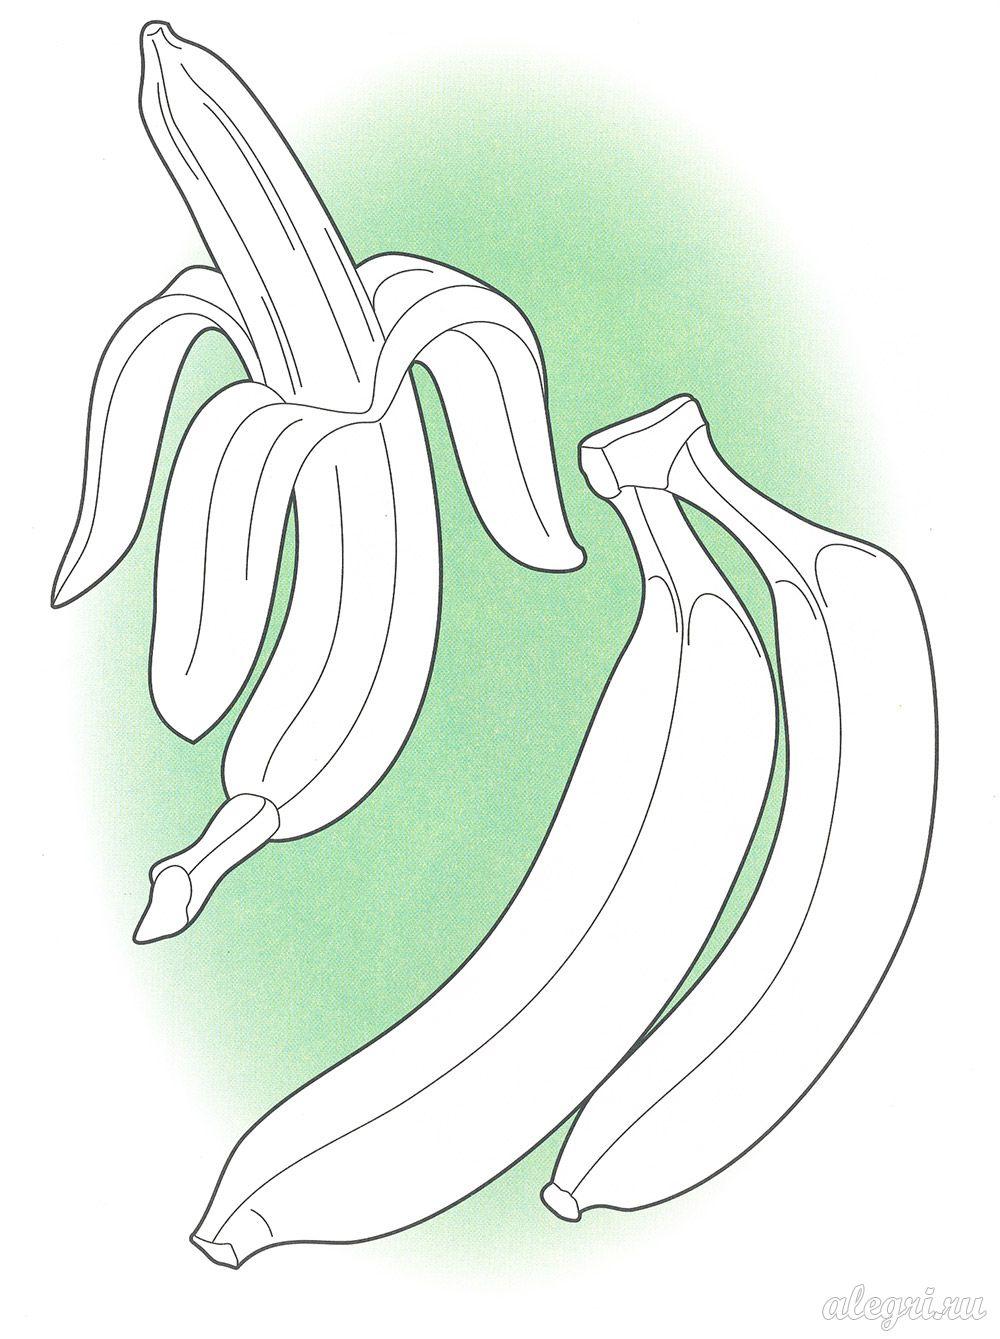 Детская раскраска. Бананы